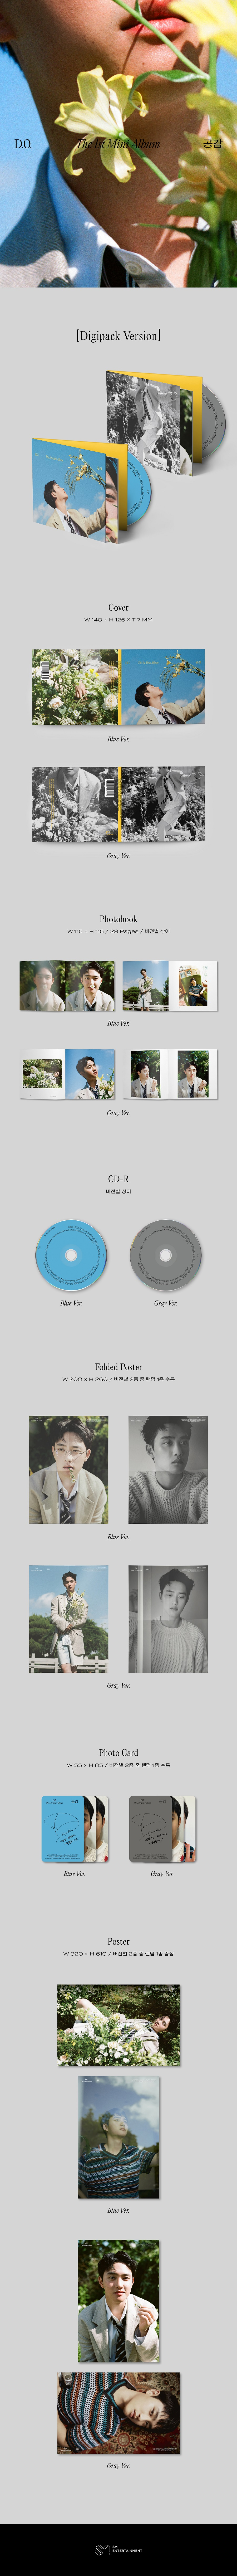 D.O. - 共感 [Digipack Ver. - Random Cover]